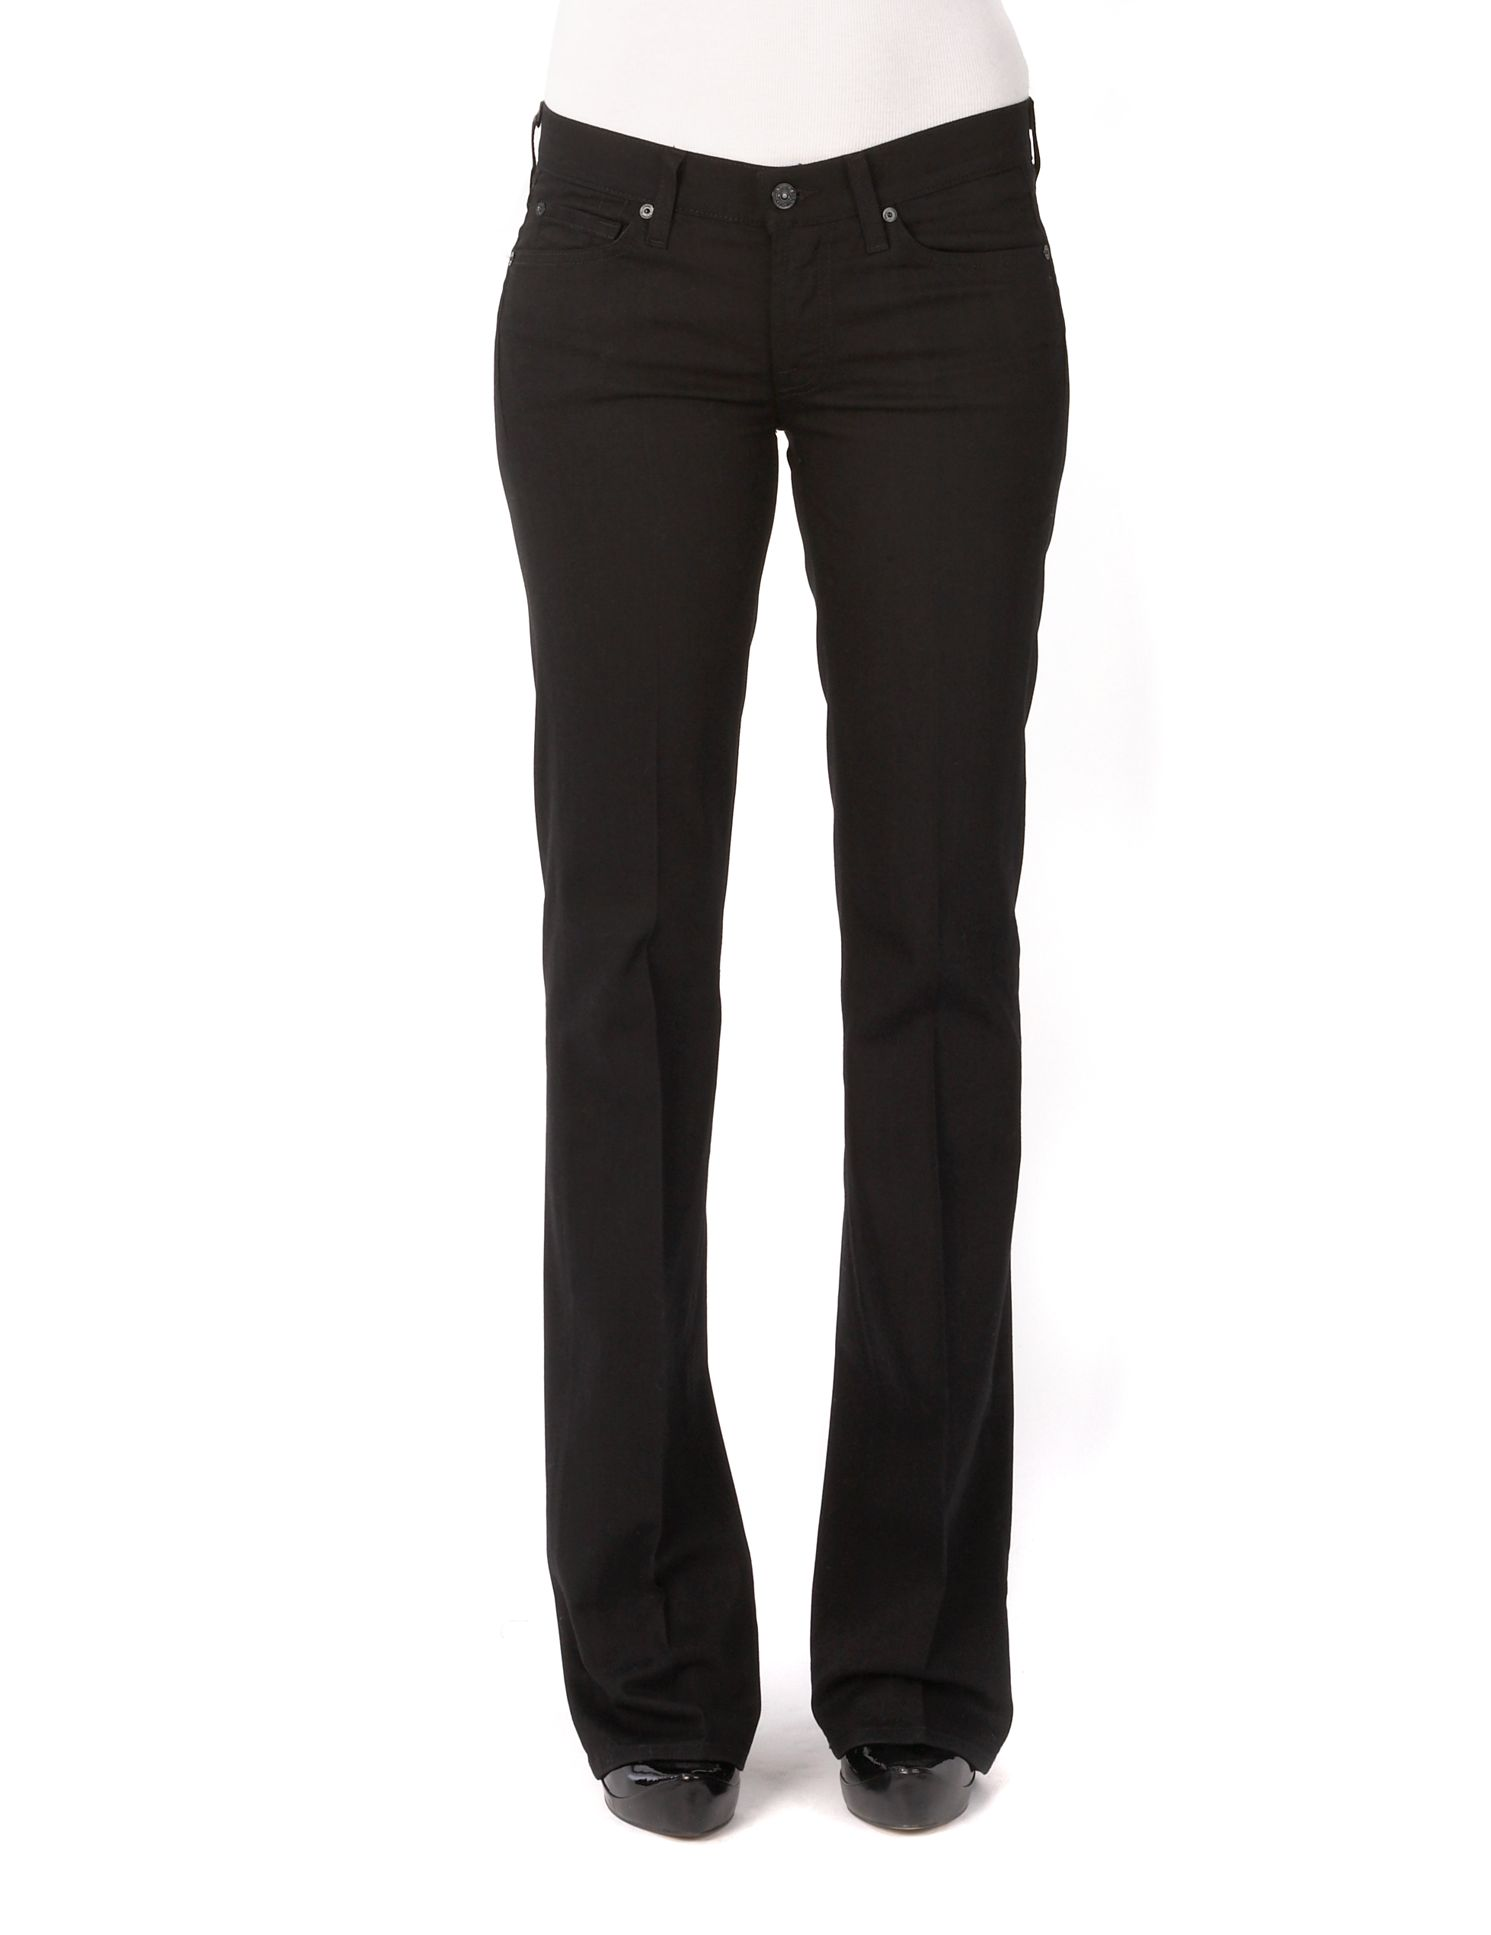 7 For All Mankind Denim The Skinny Mid-rise Jacquard Skinny Jeans in Black